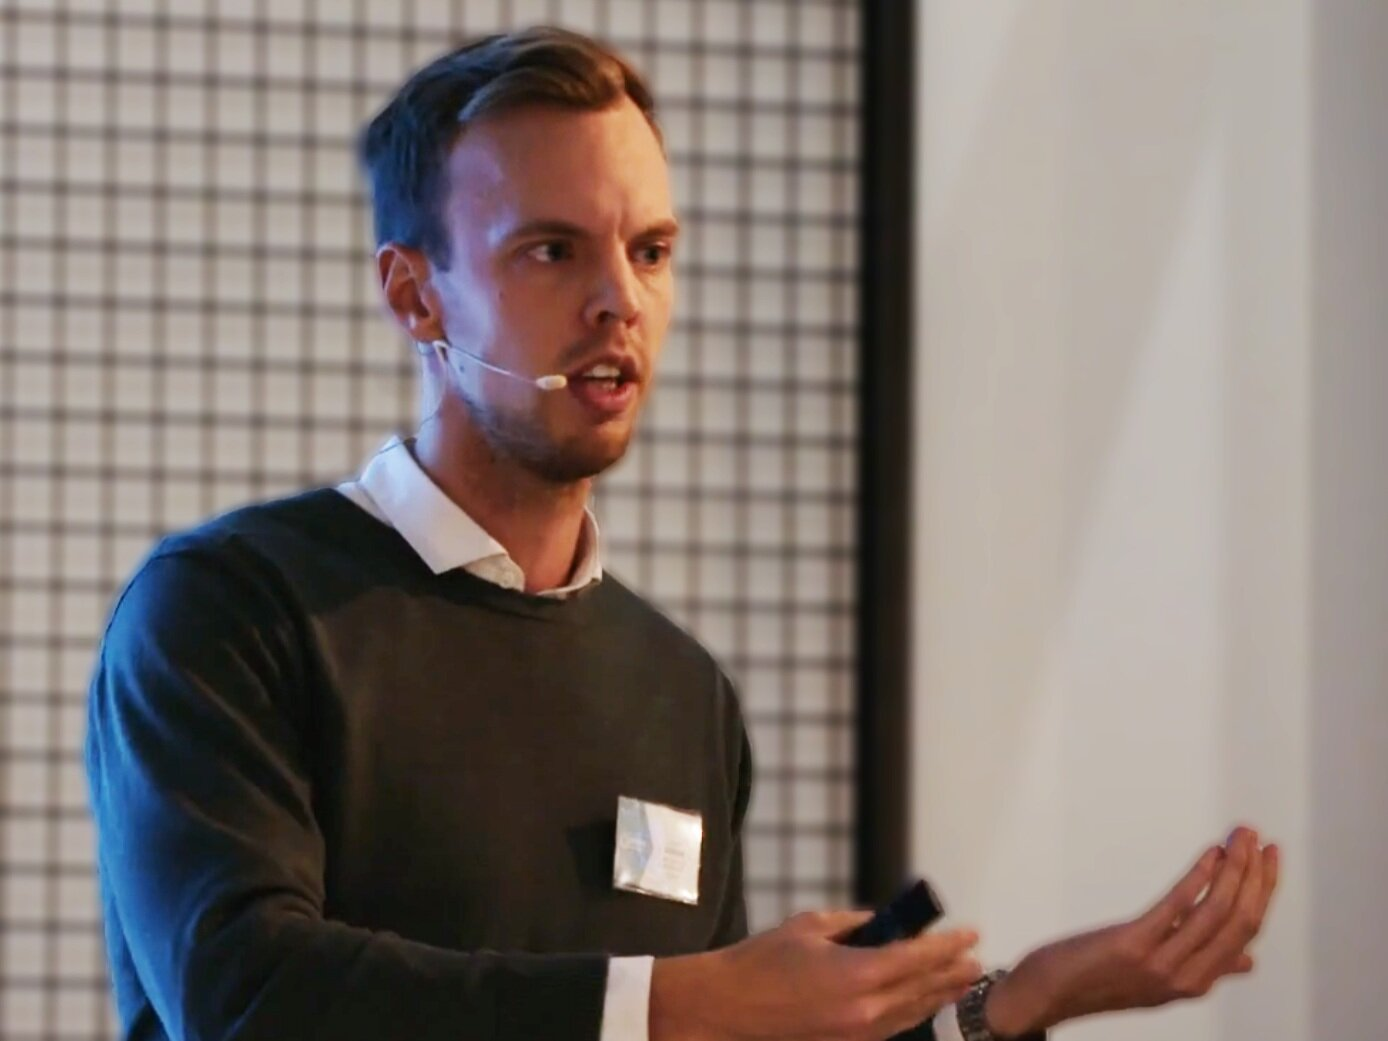 Joakim Sjöblom, CEO of Minna Technologies